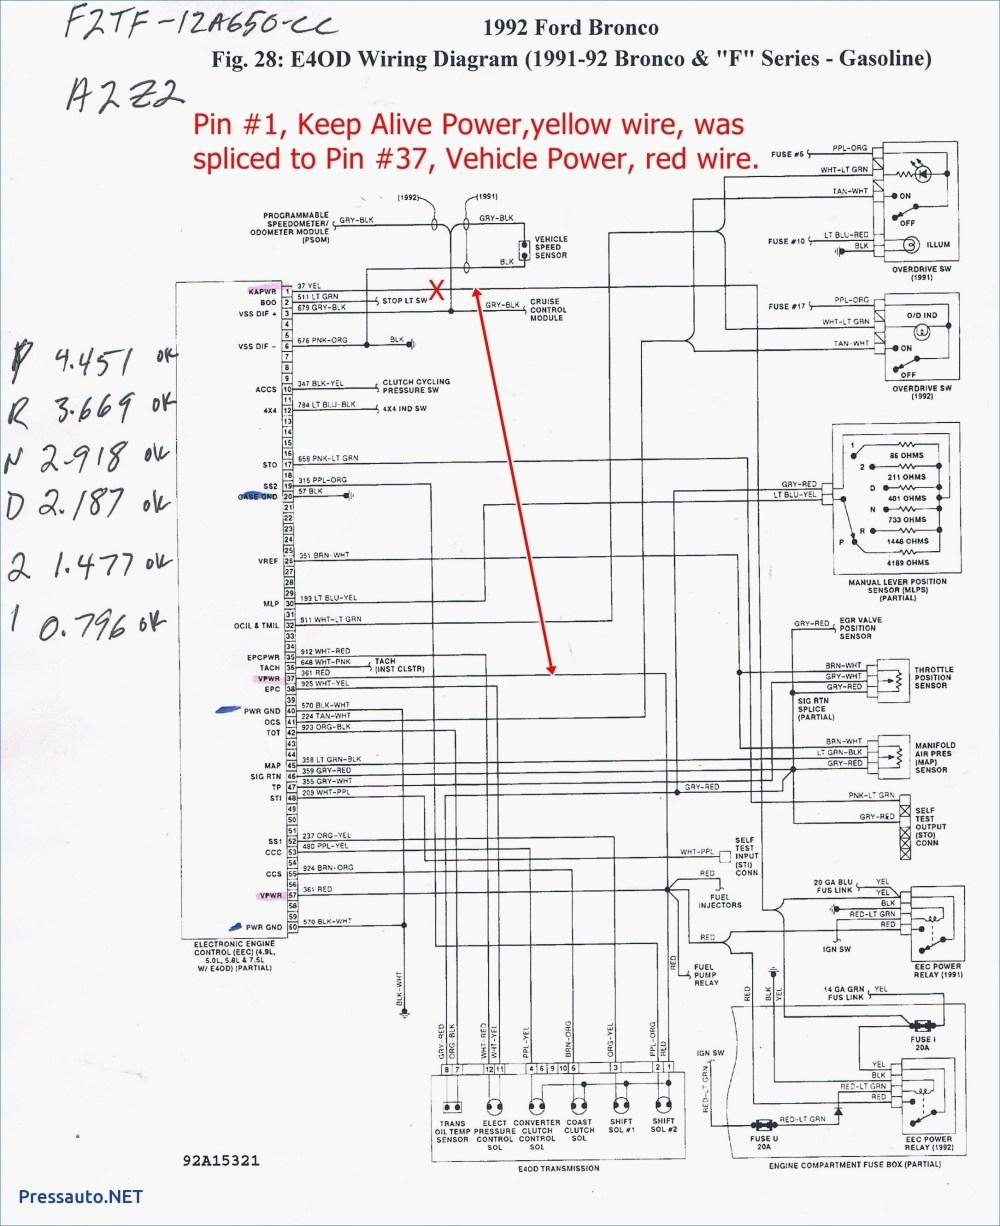 medium resolution of 2002 dodge ram 1500 stereo wiring diagram free wiring diagram rh ricardolevinsmorales com 2002 dodge 2500 radio wiring diagram 2002 dodge 2500 radio wiring